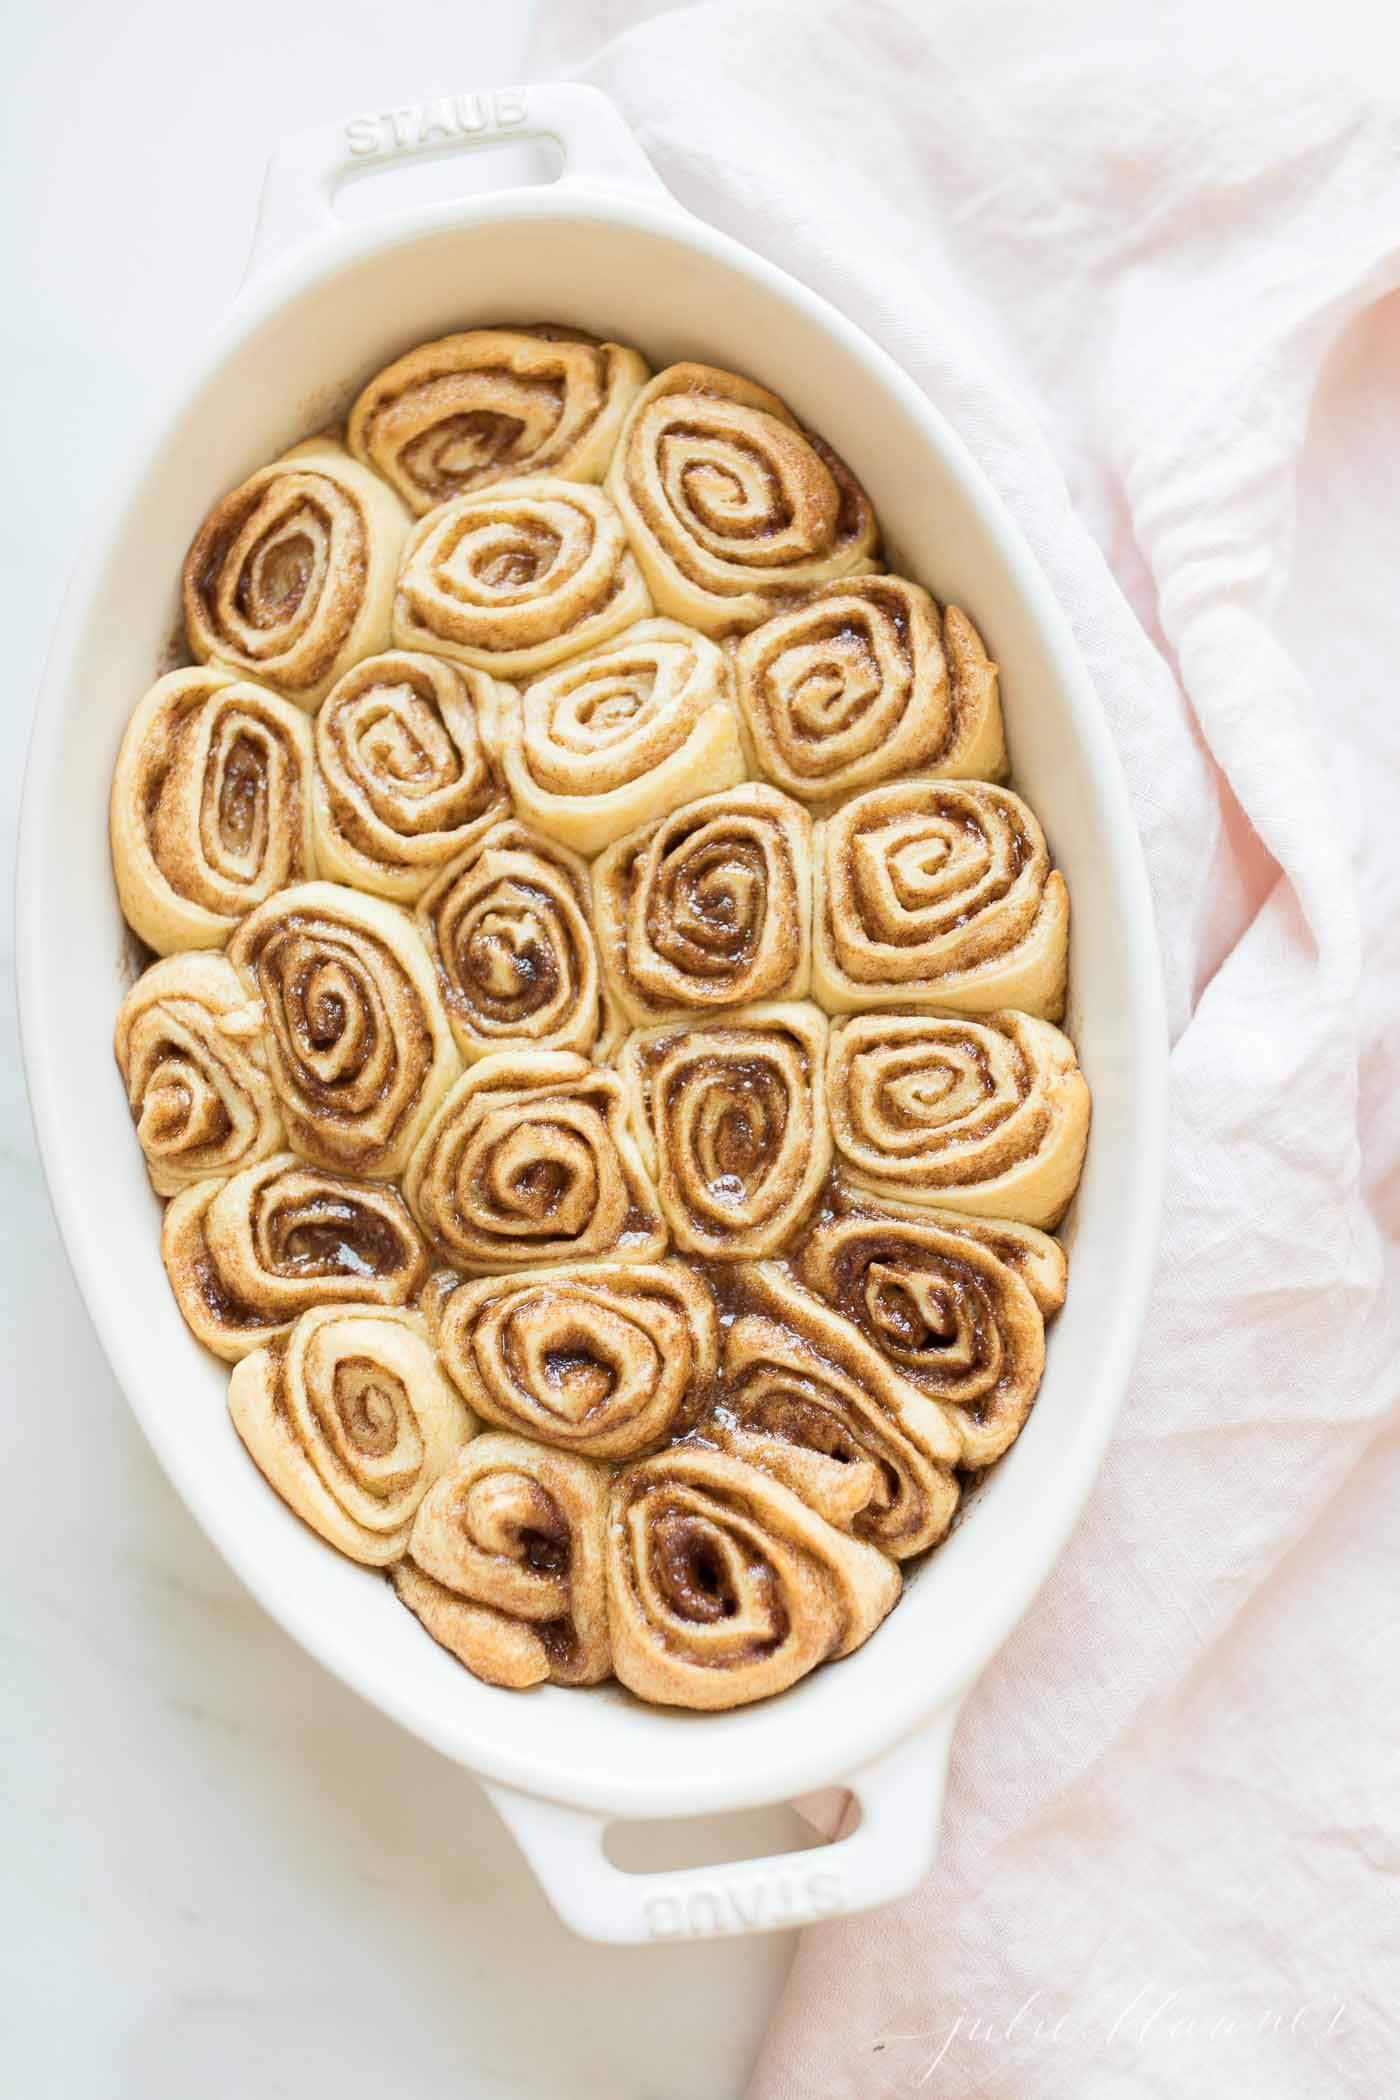 baked cinnamon rolls in casserole dish